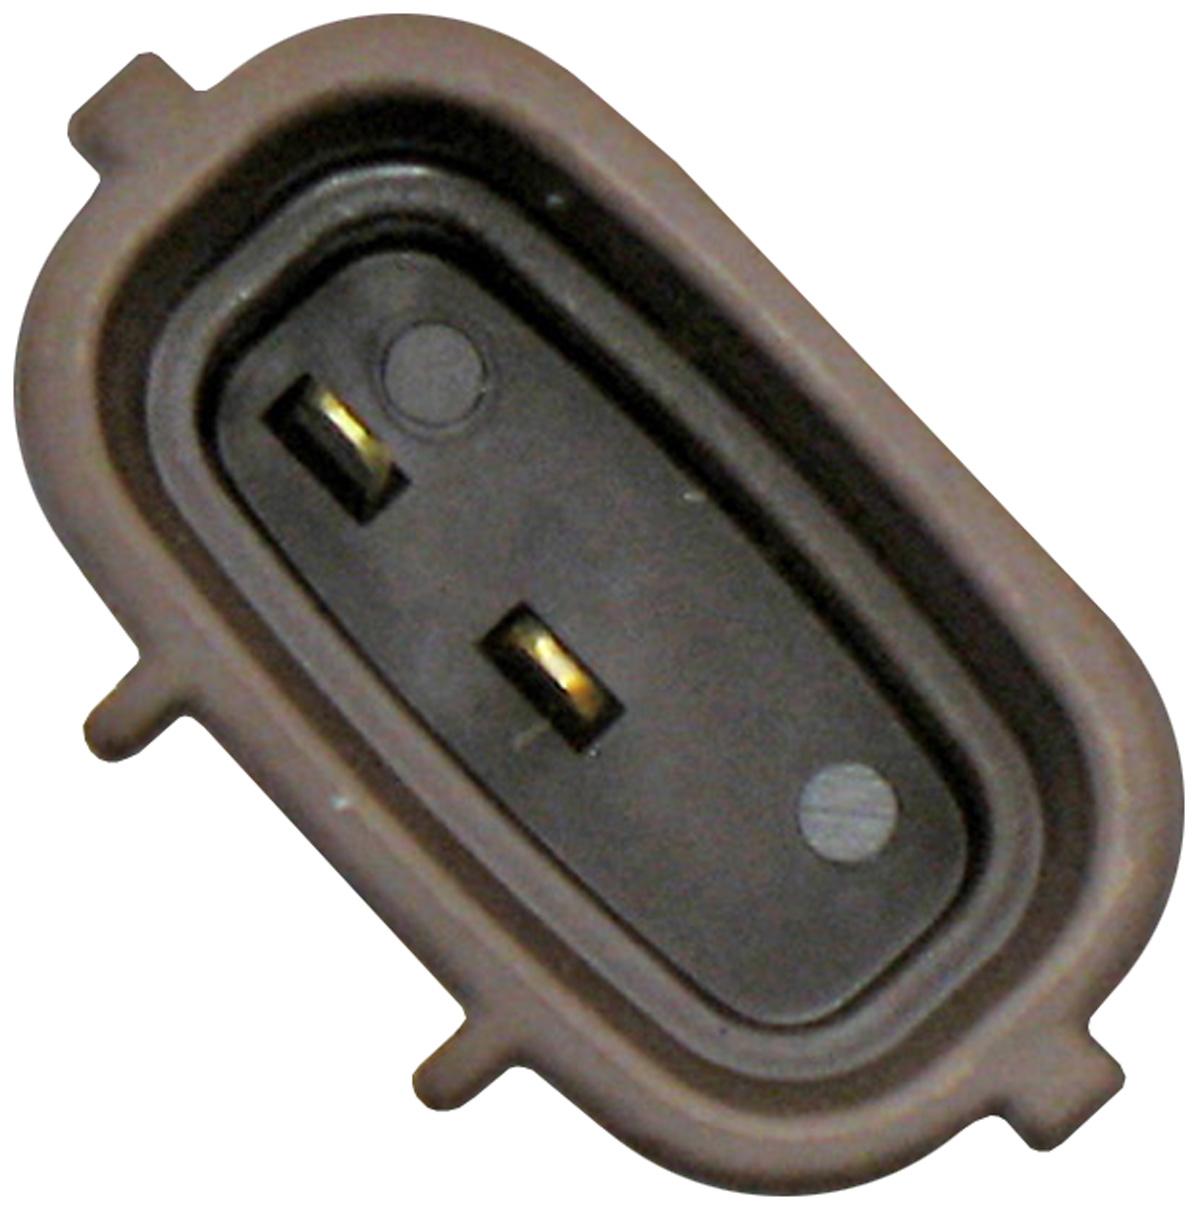 Voltage Regulator Wiring Diagram On Denso External Voltage Regulator